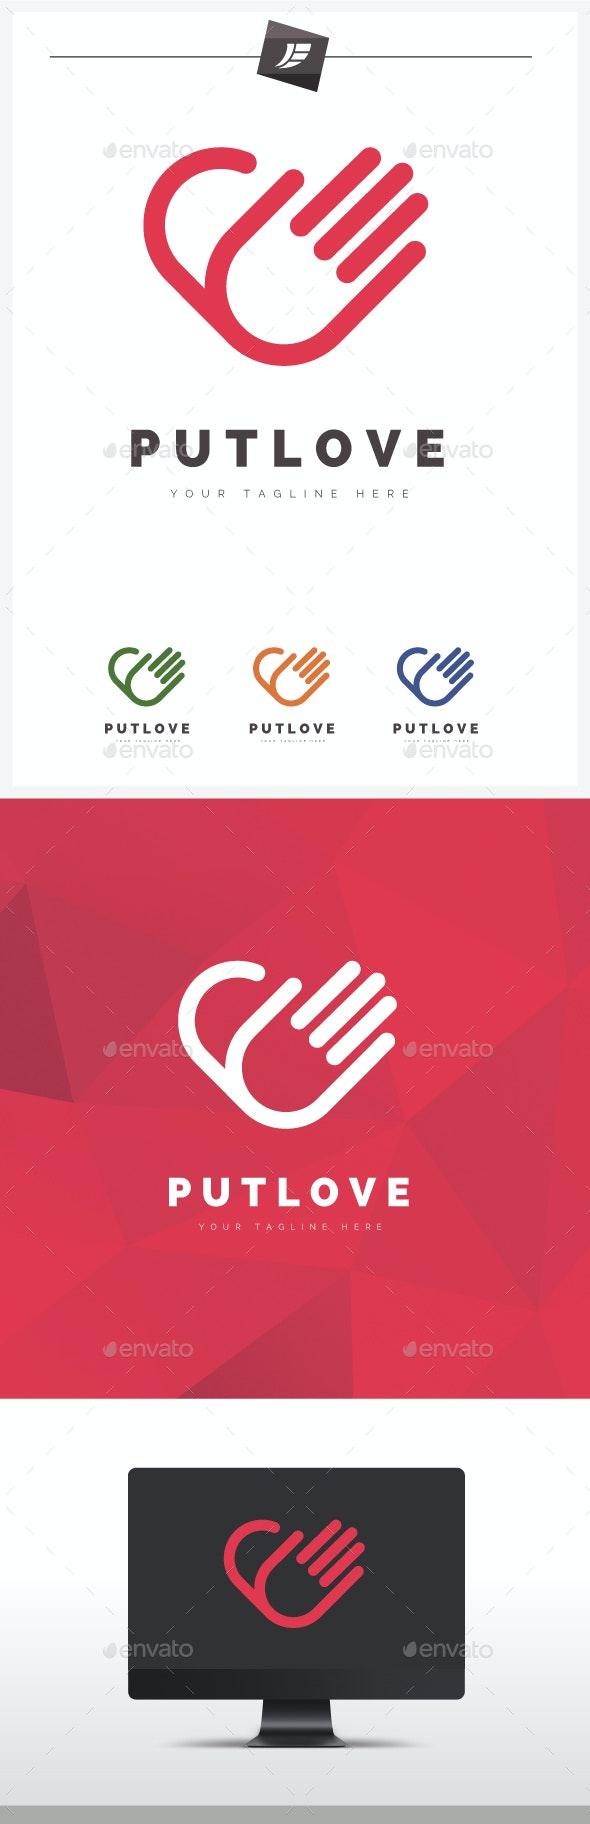 Put Love Logo - Symbols Logo Templates